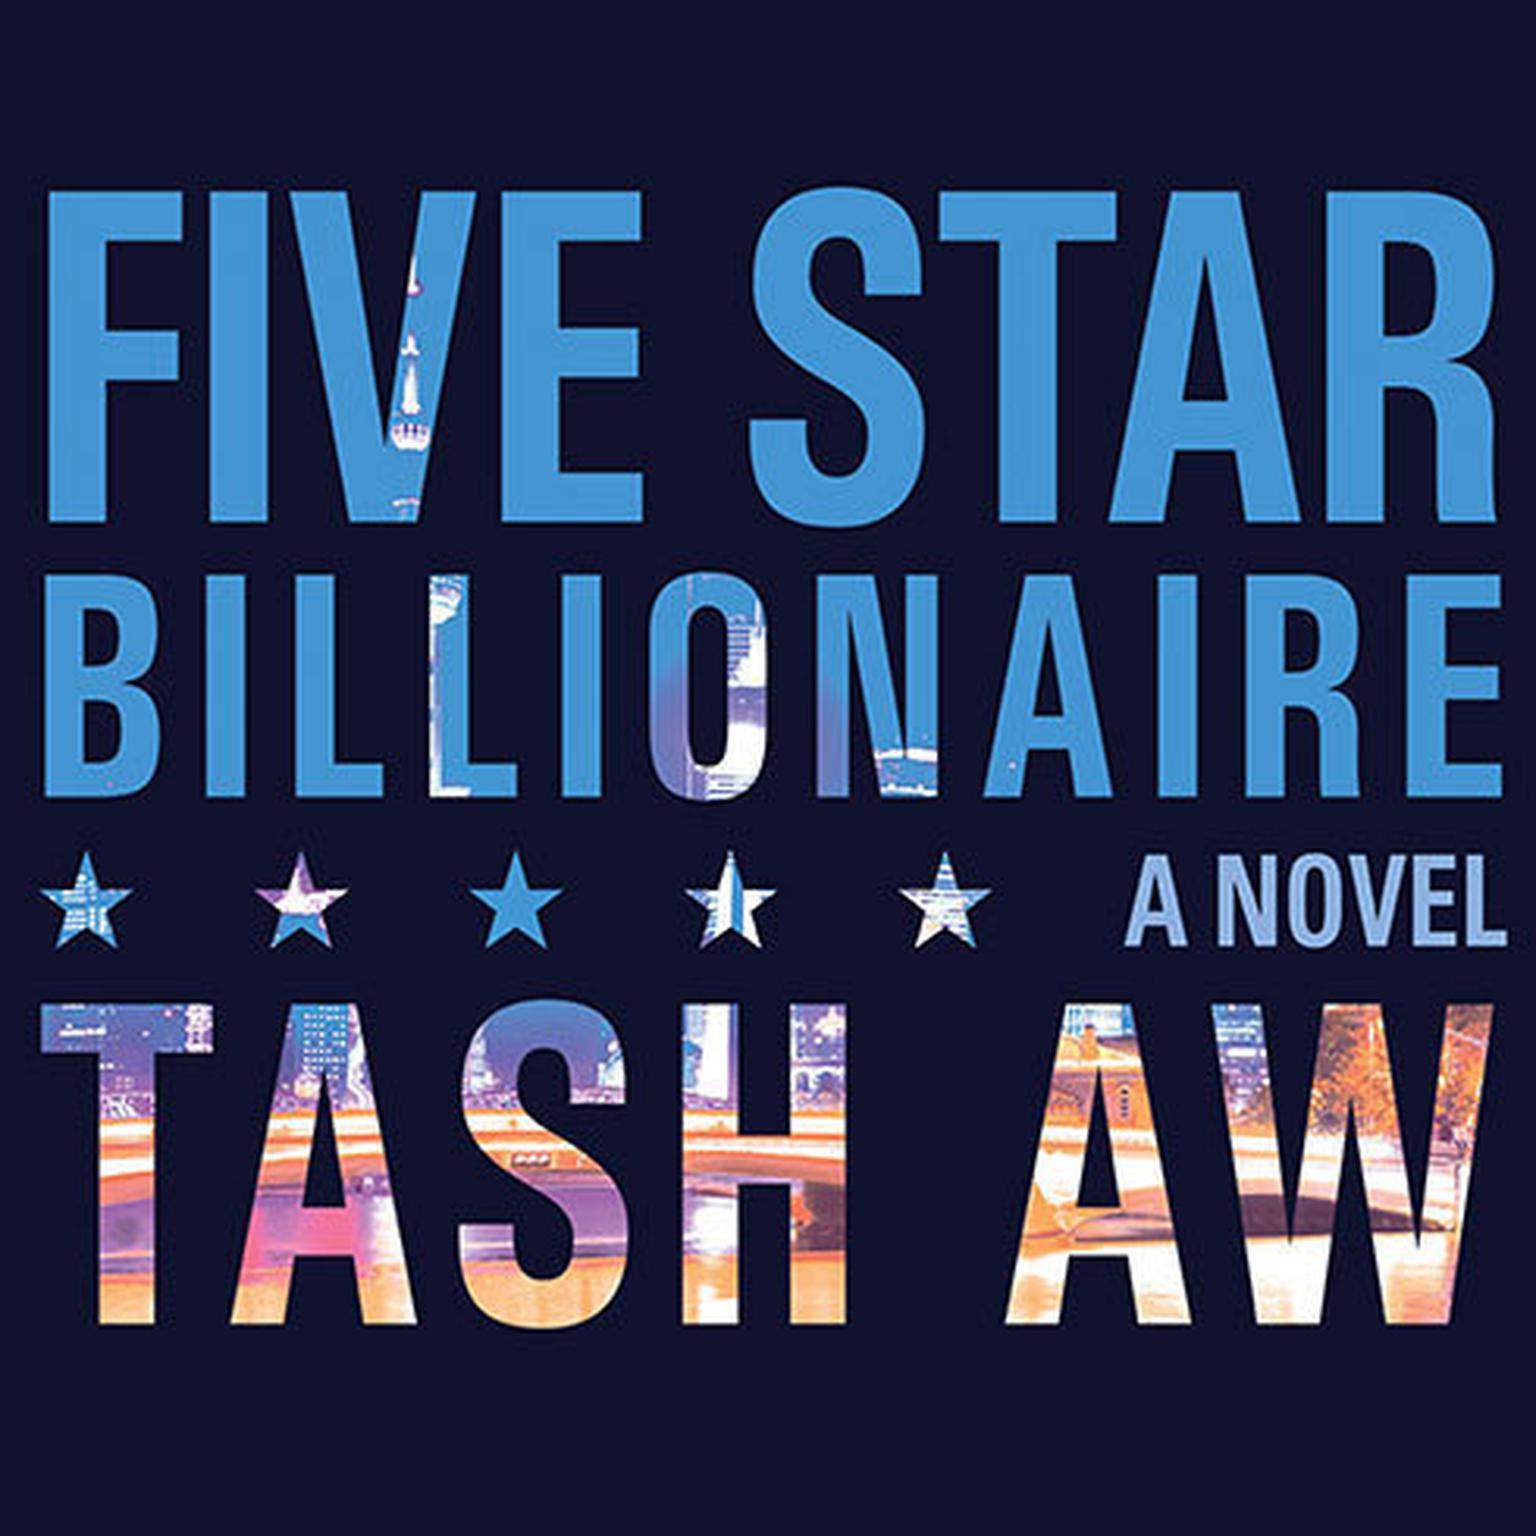 Printable Five-Star Billionaire Audiobook Cover Art